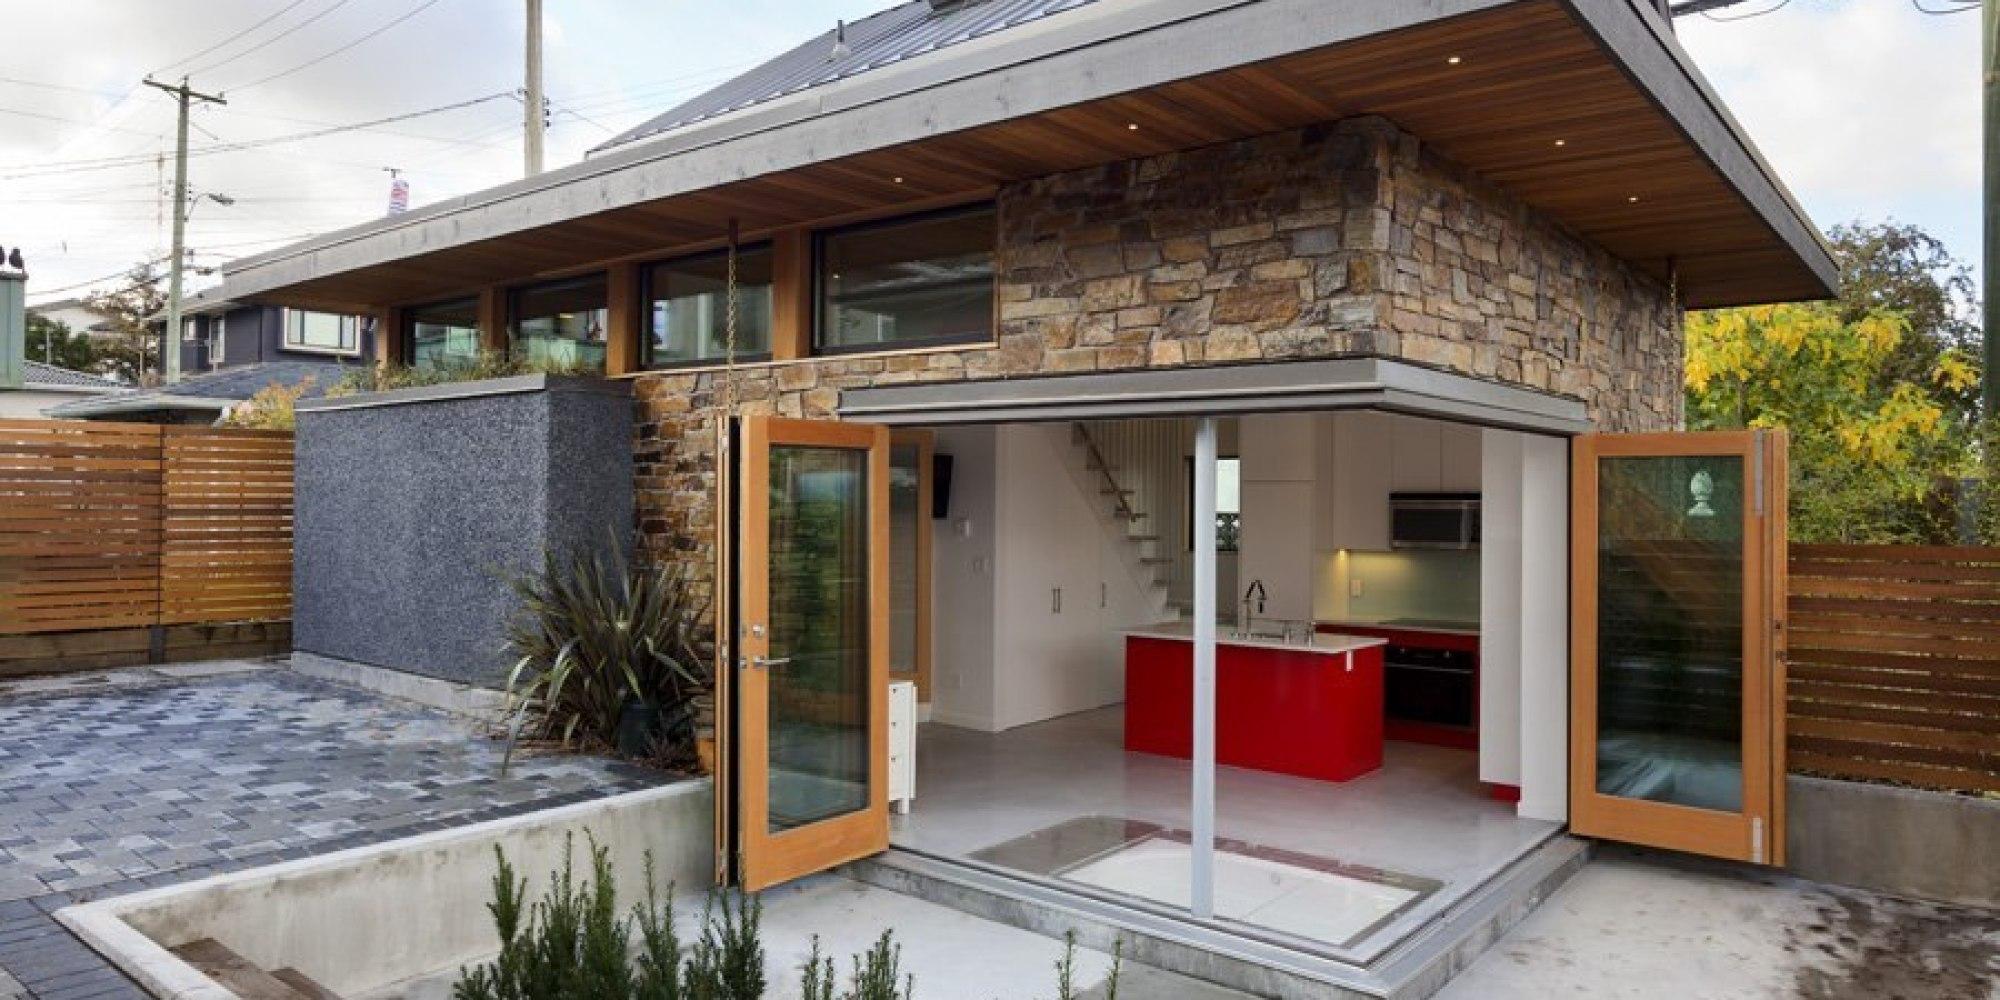 Laneway Housing In Vancouver Remains Popular